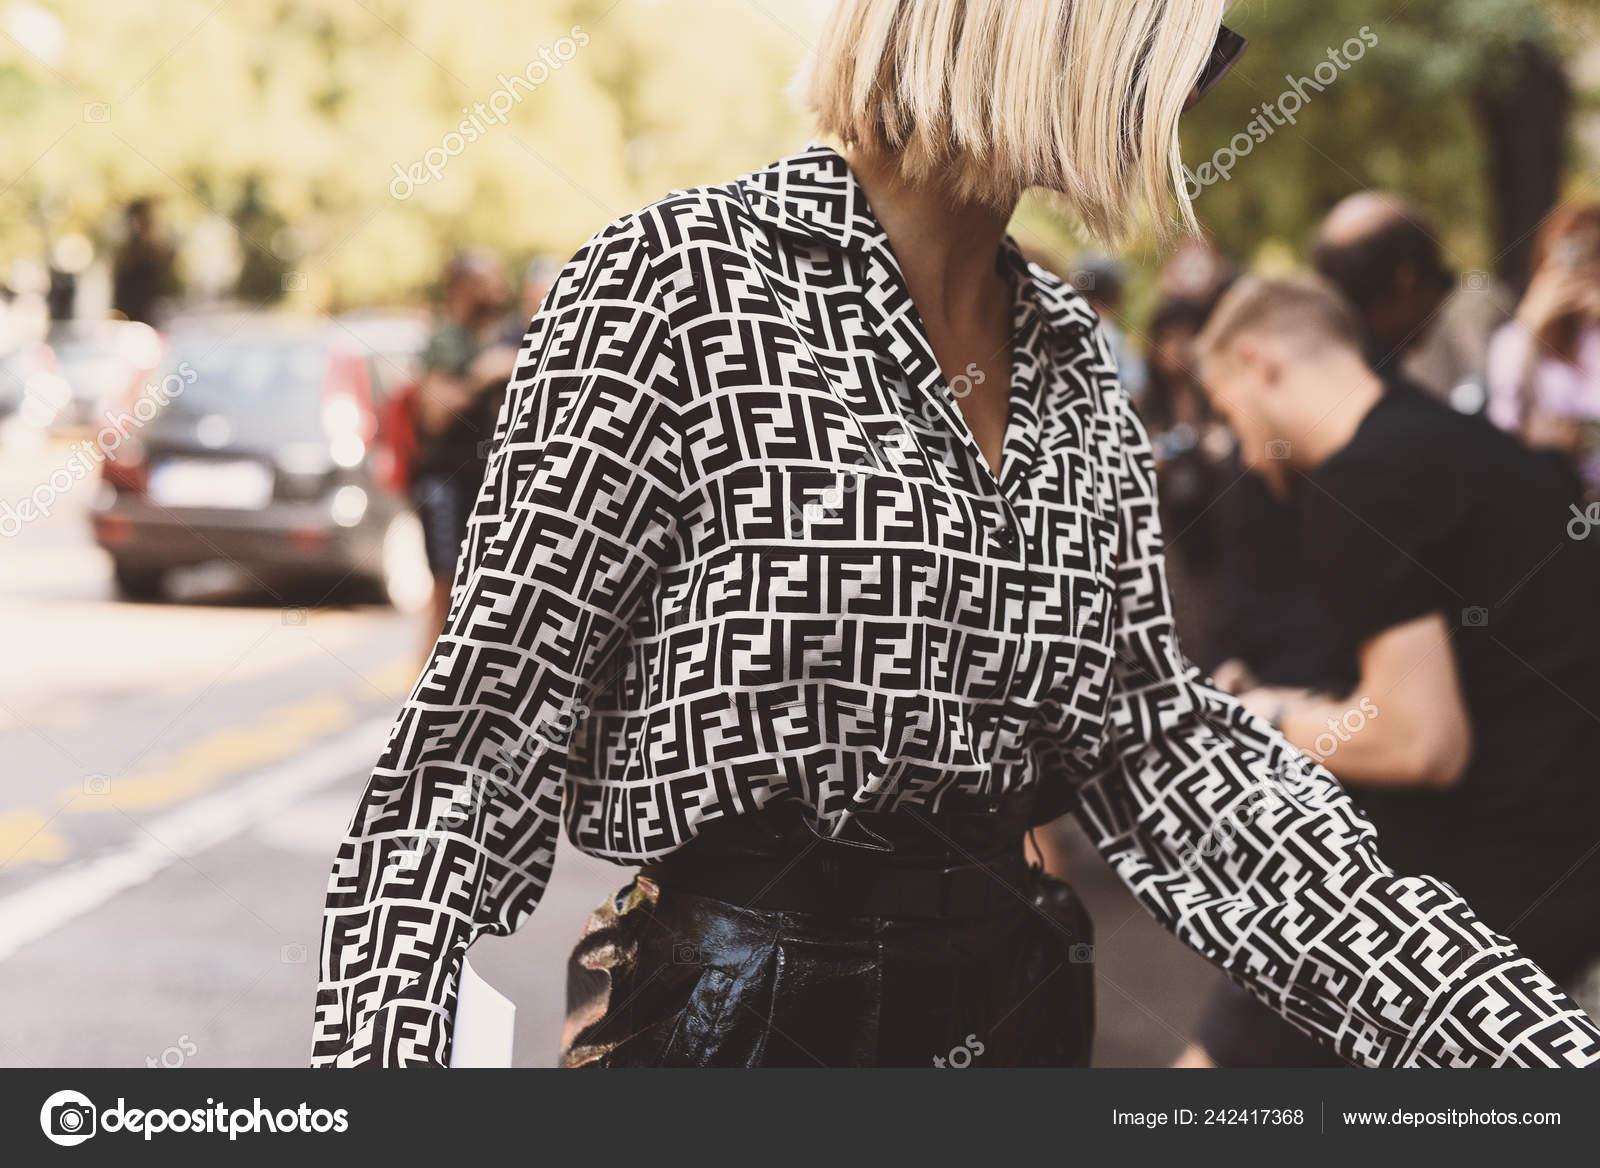 ea8f759f46555 Fendi Clothing Street Style Outfit Milan Fashion Week — Stock Photo